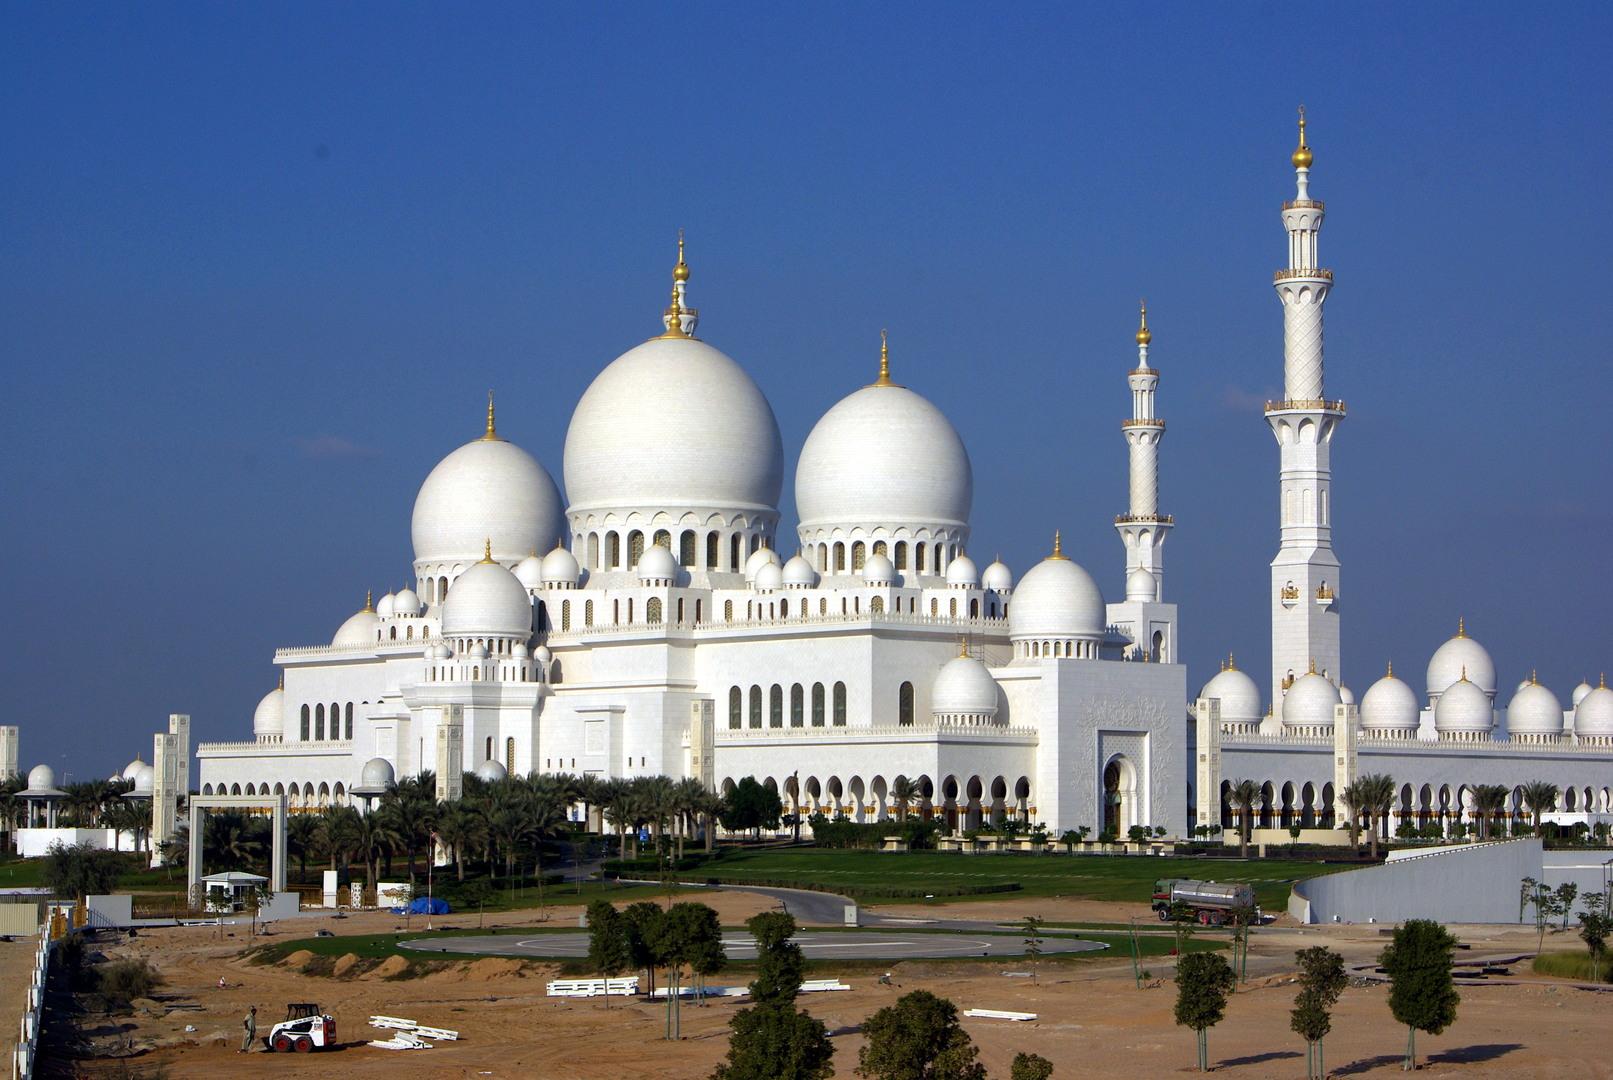 Exterior: Abu Dhabi Wallpaper